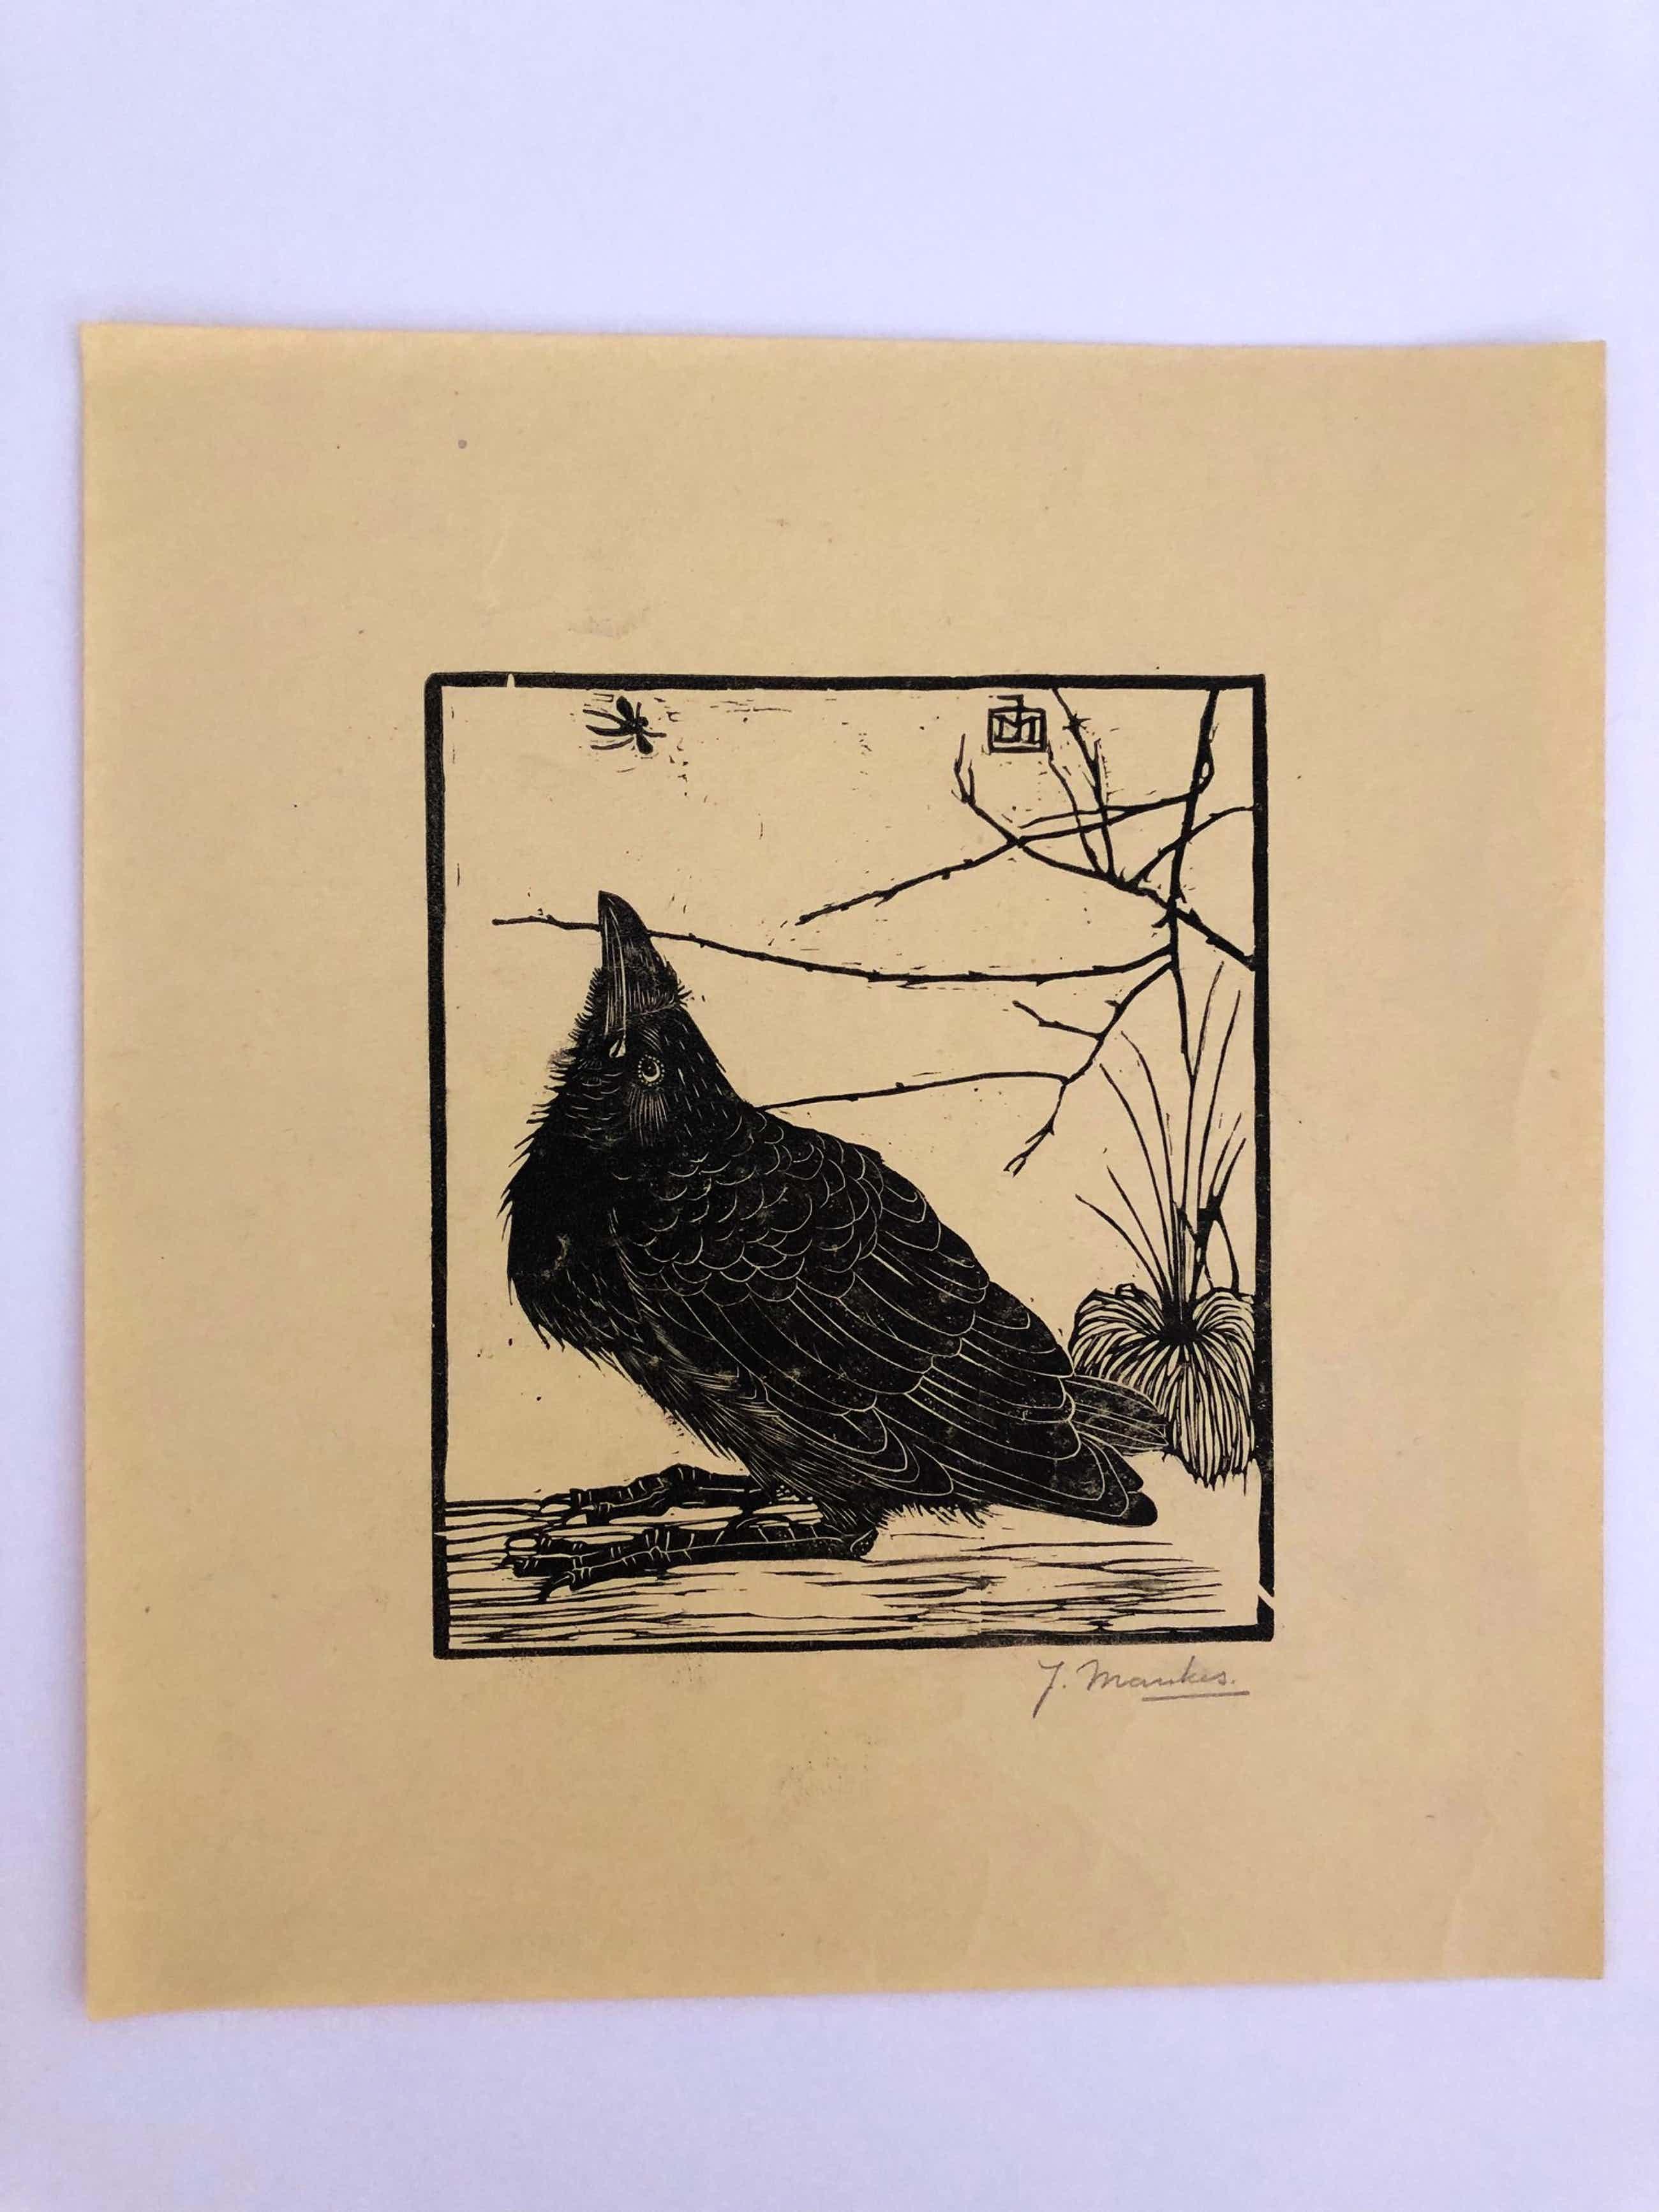 Jan Mankes - Houtsnede kleine kraai kijkend naar mugje - Gesigneerd - 1918 kopen? Bied vanaf 395!